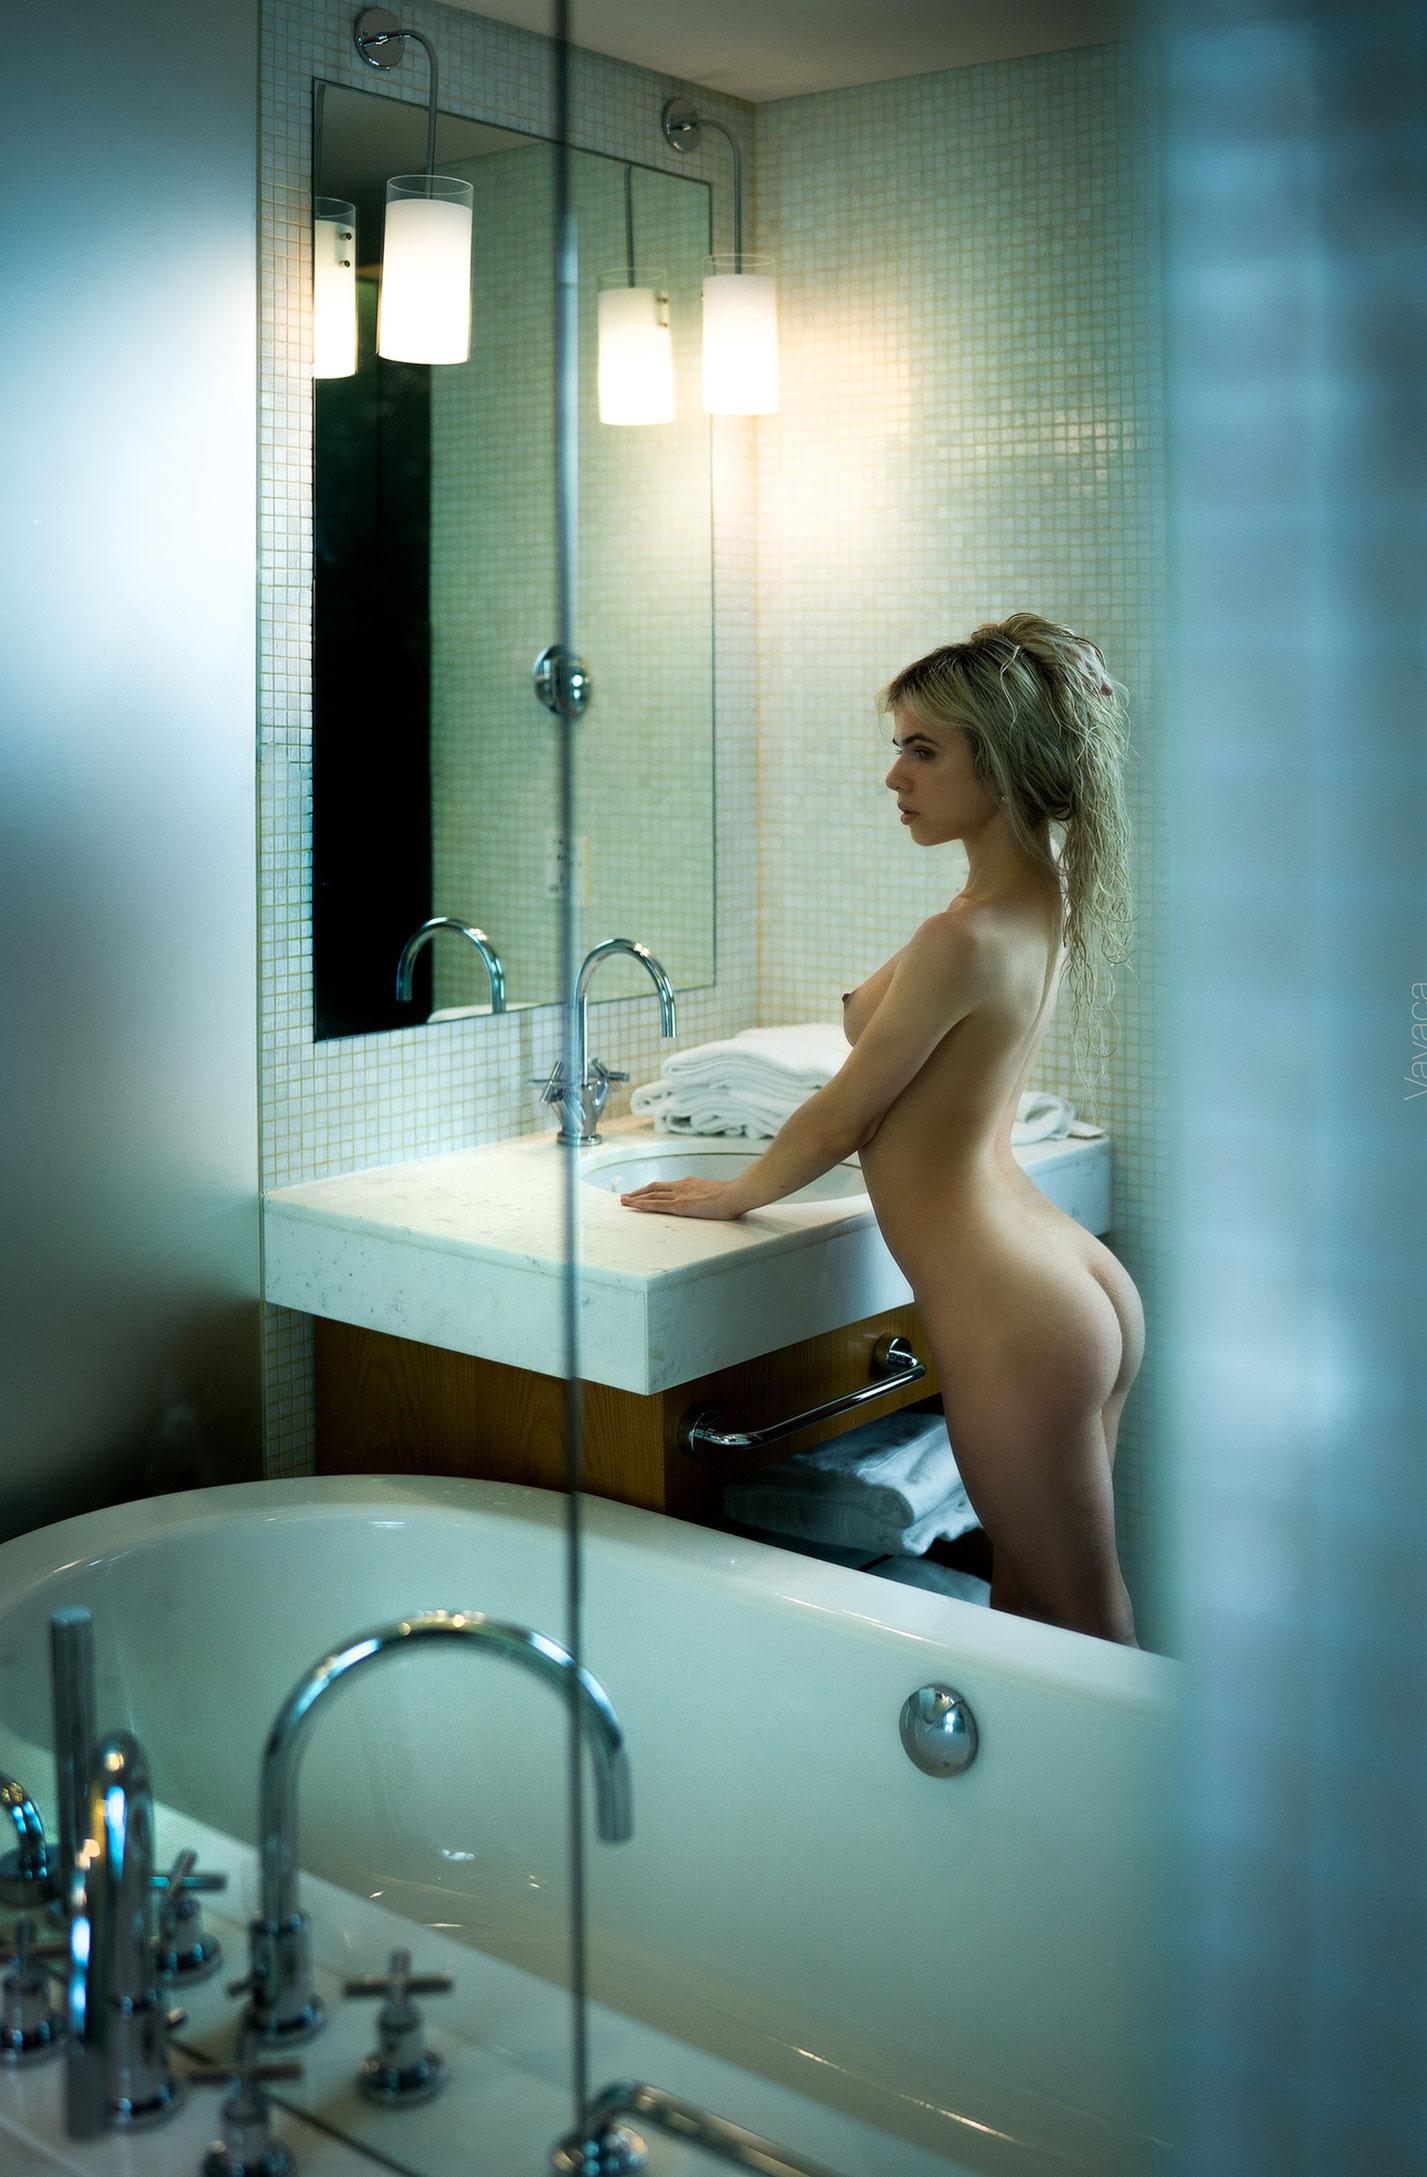 Александра Смелова принимает ванну / фото 07